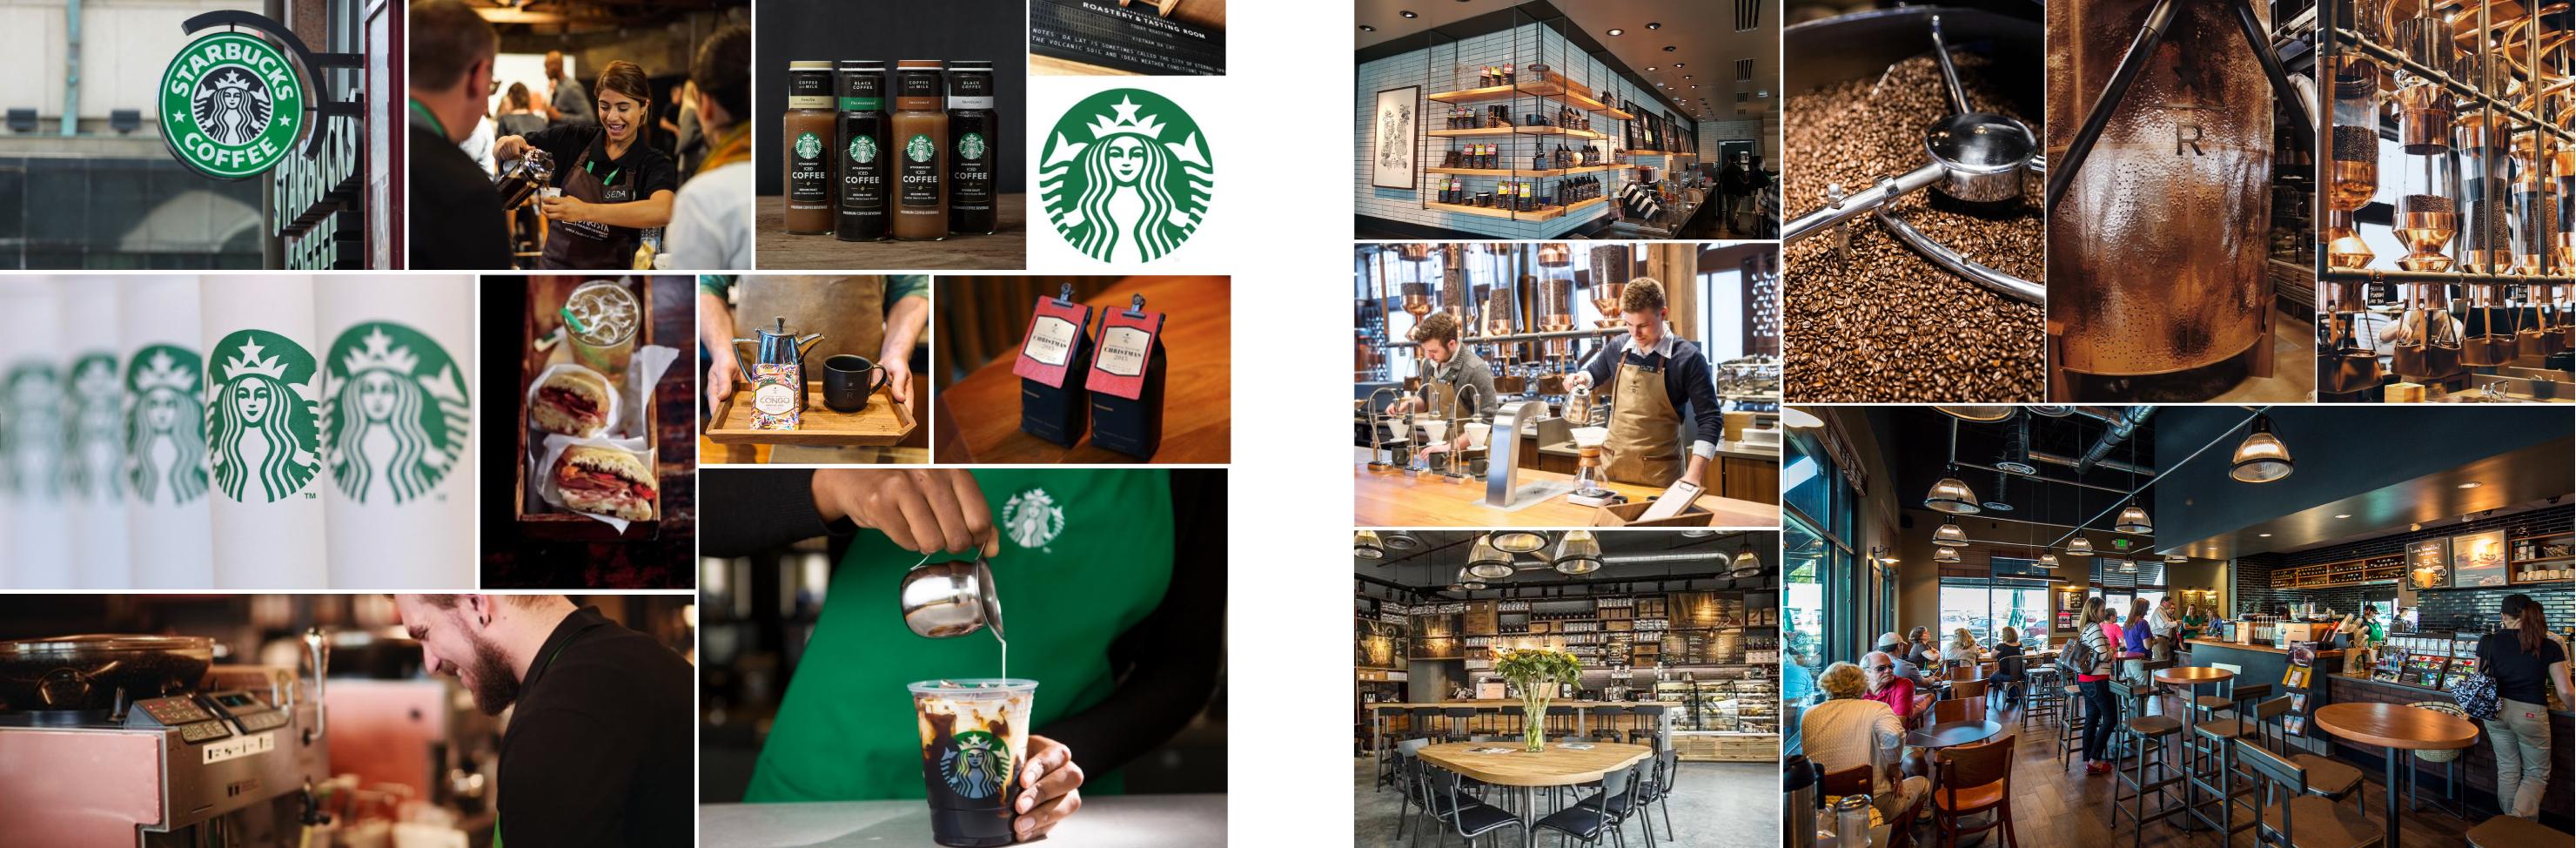 Starbuck brand identity and Interior Identity Board